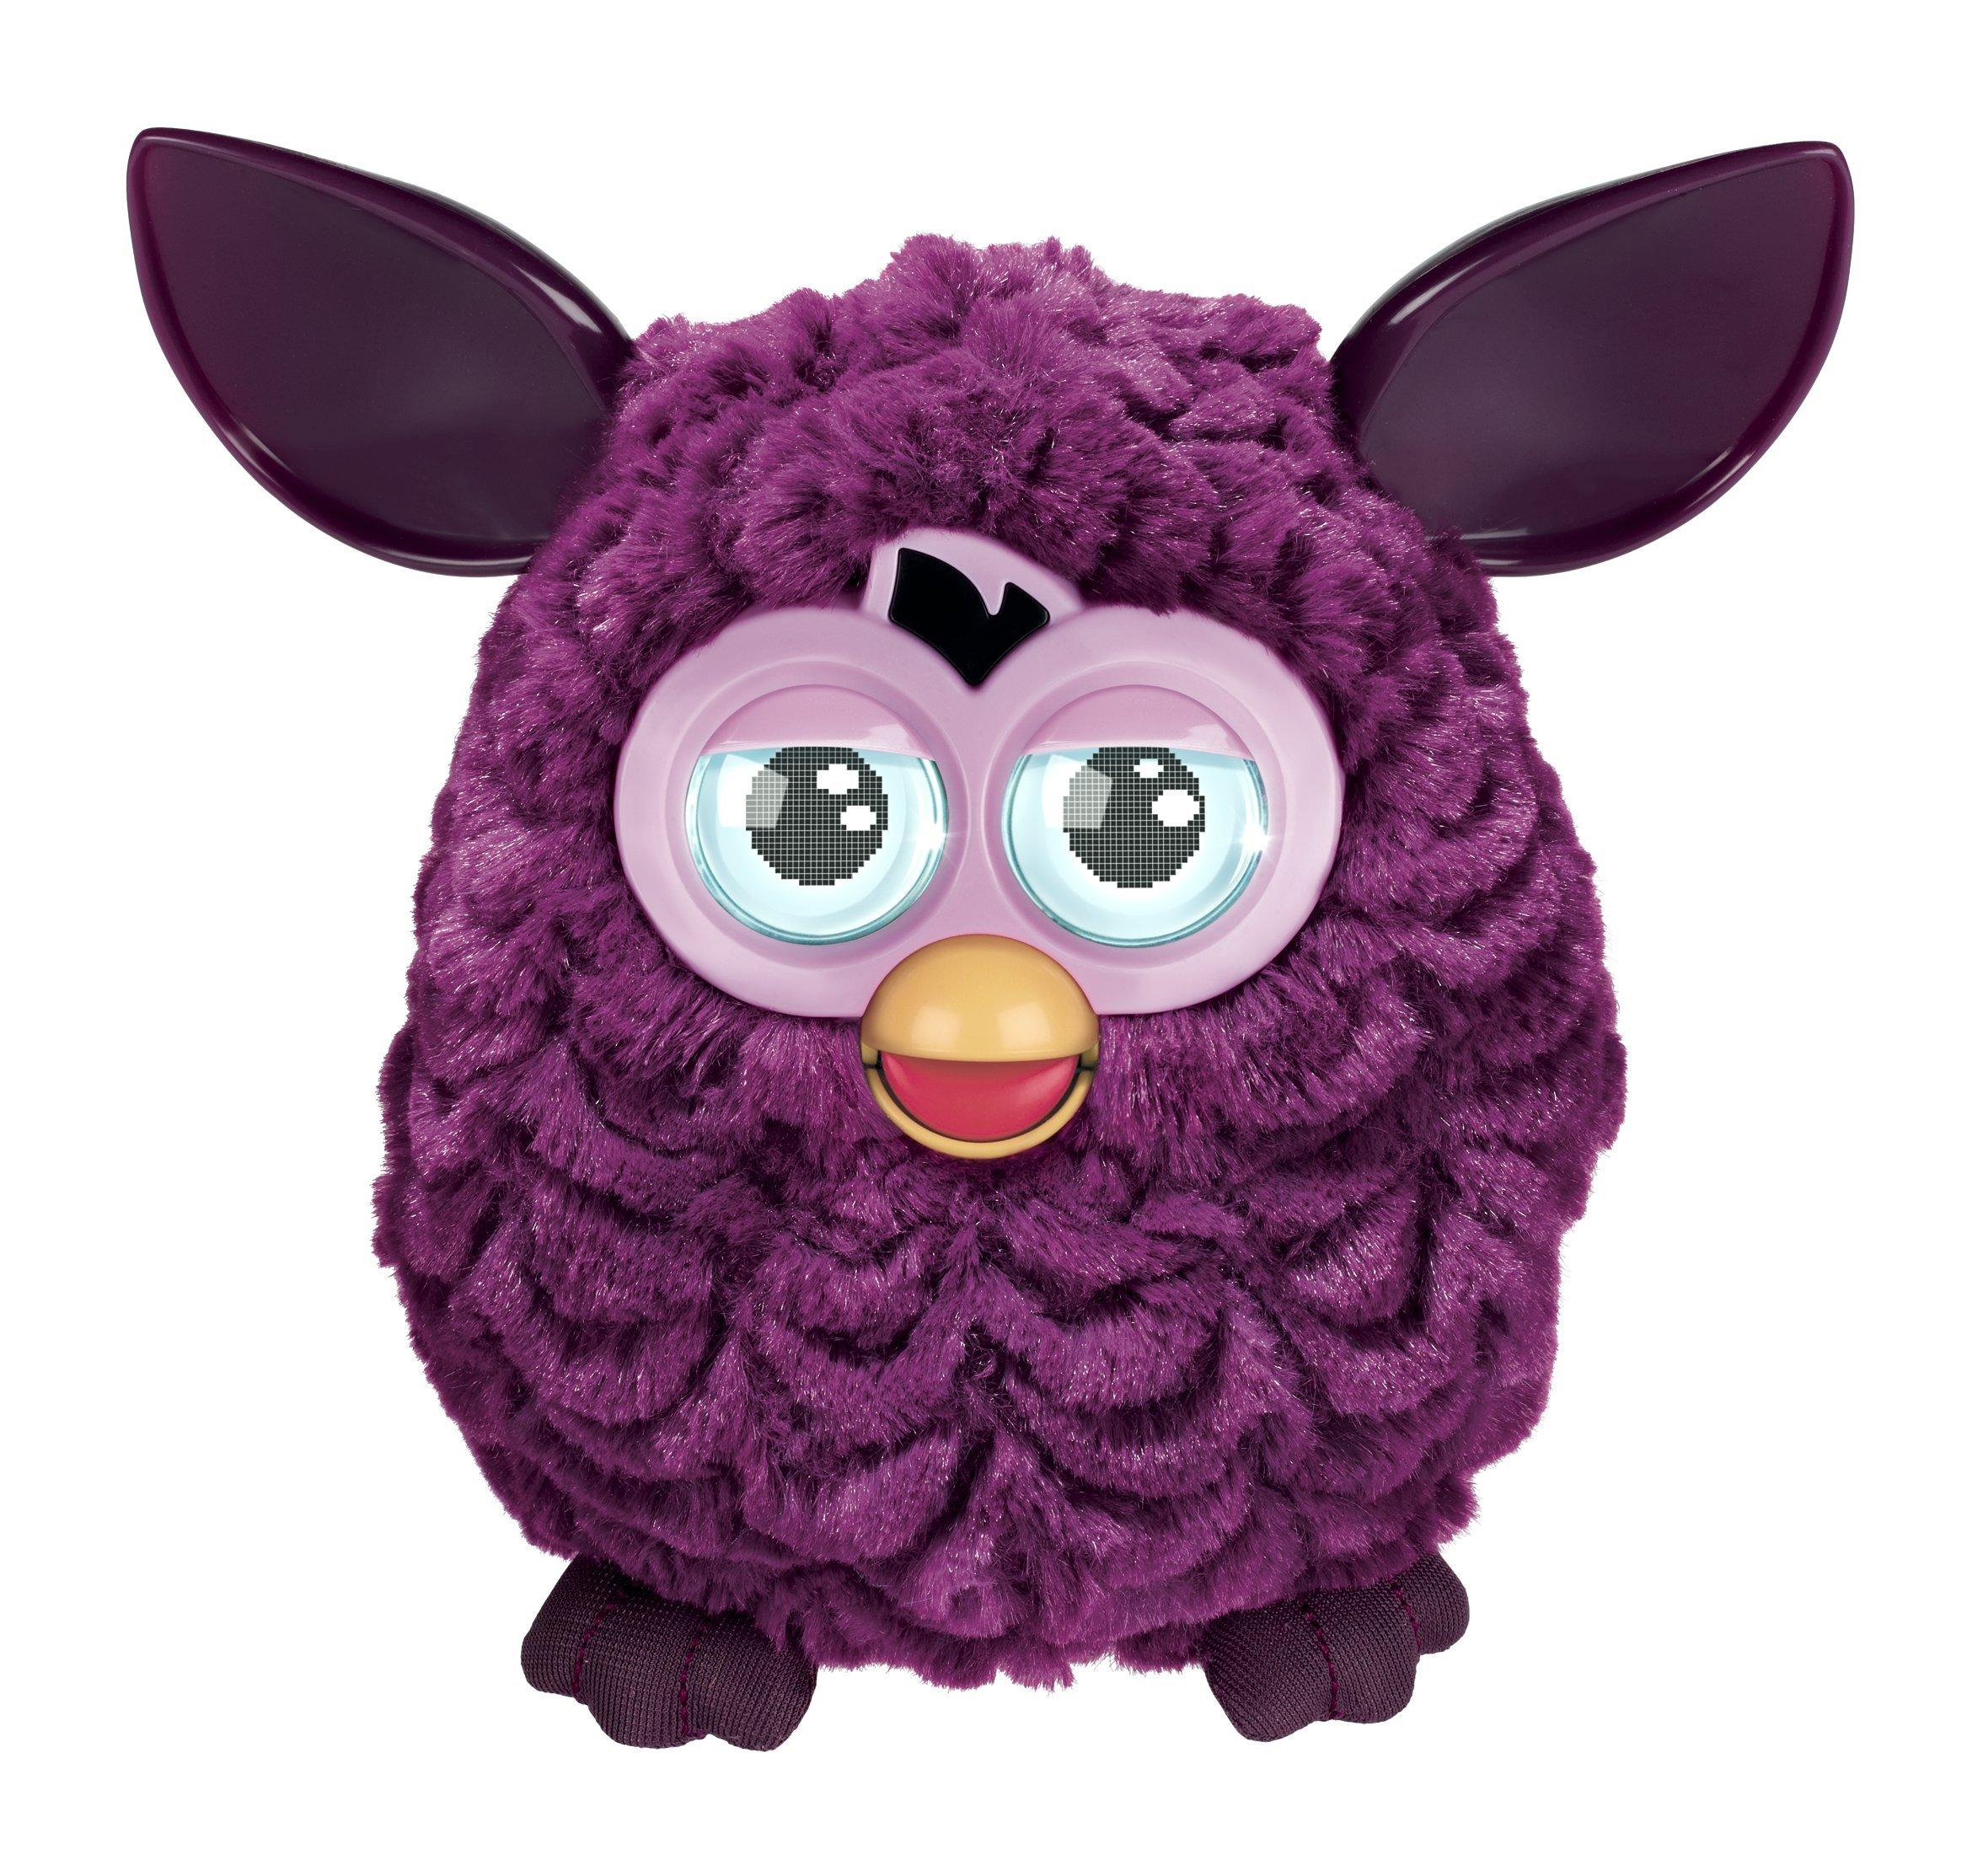 Hasbro Furby Plum Fairy by Hasbro (Image #1)